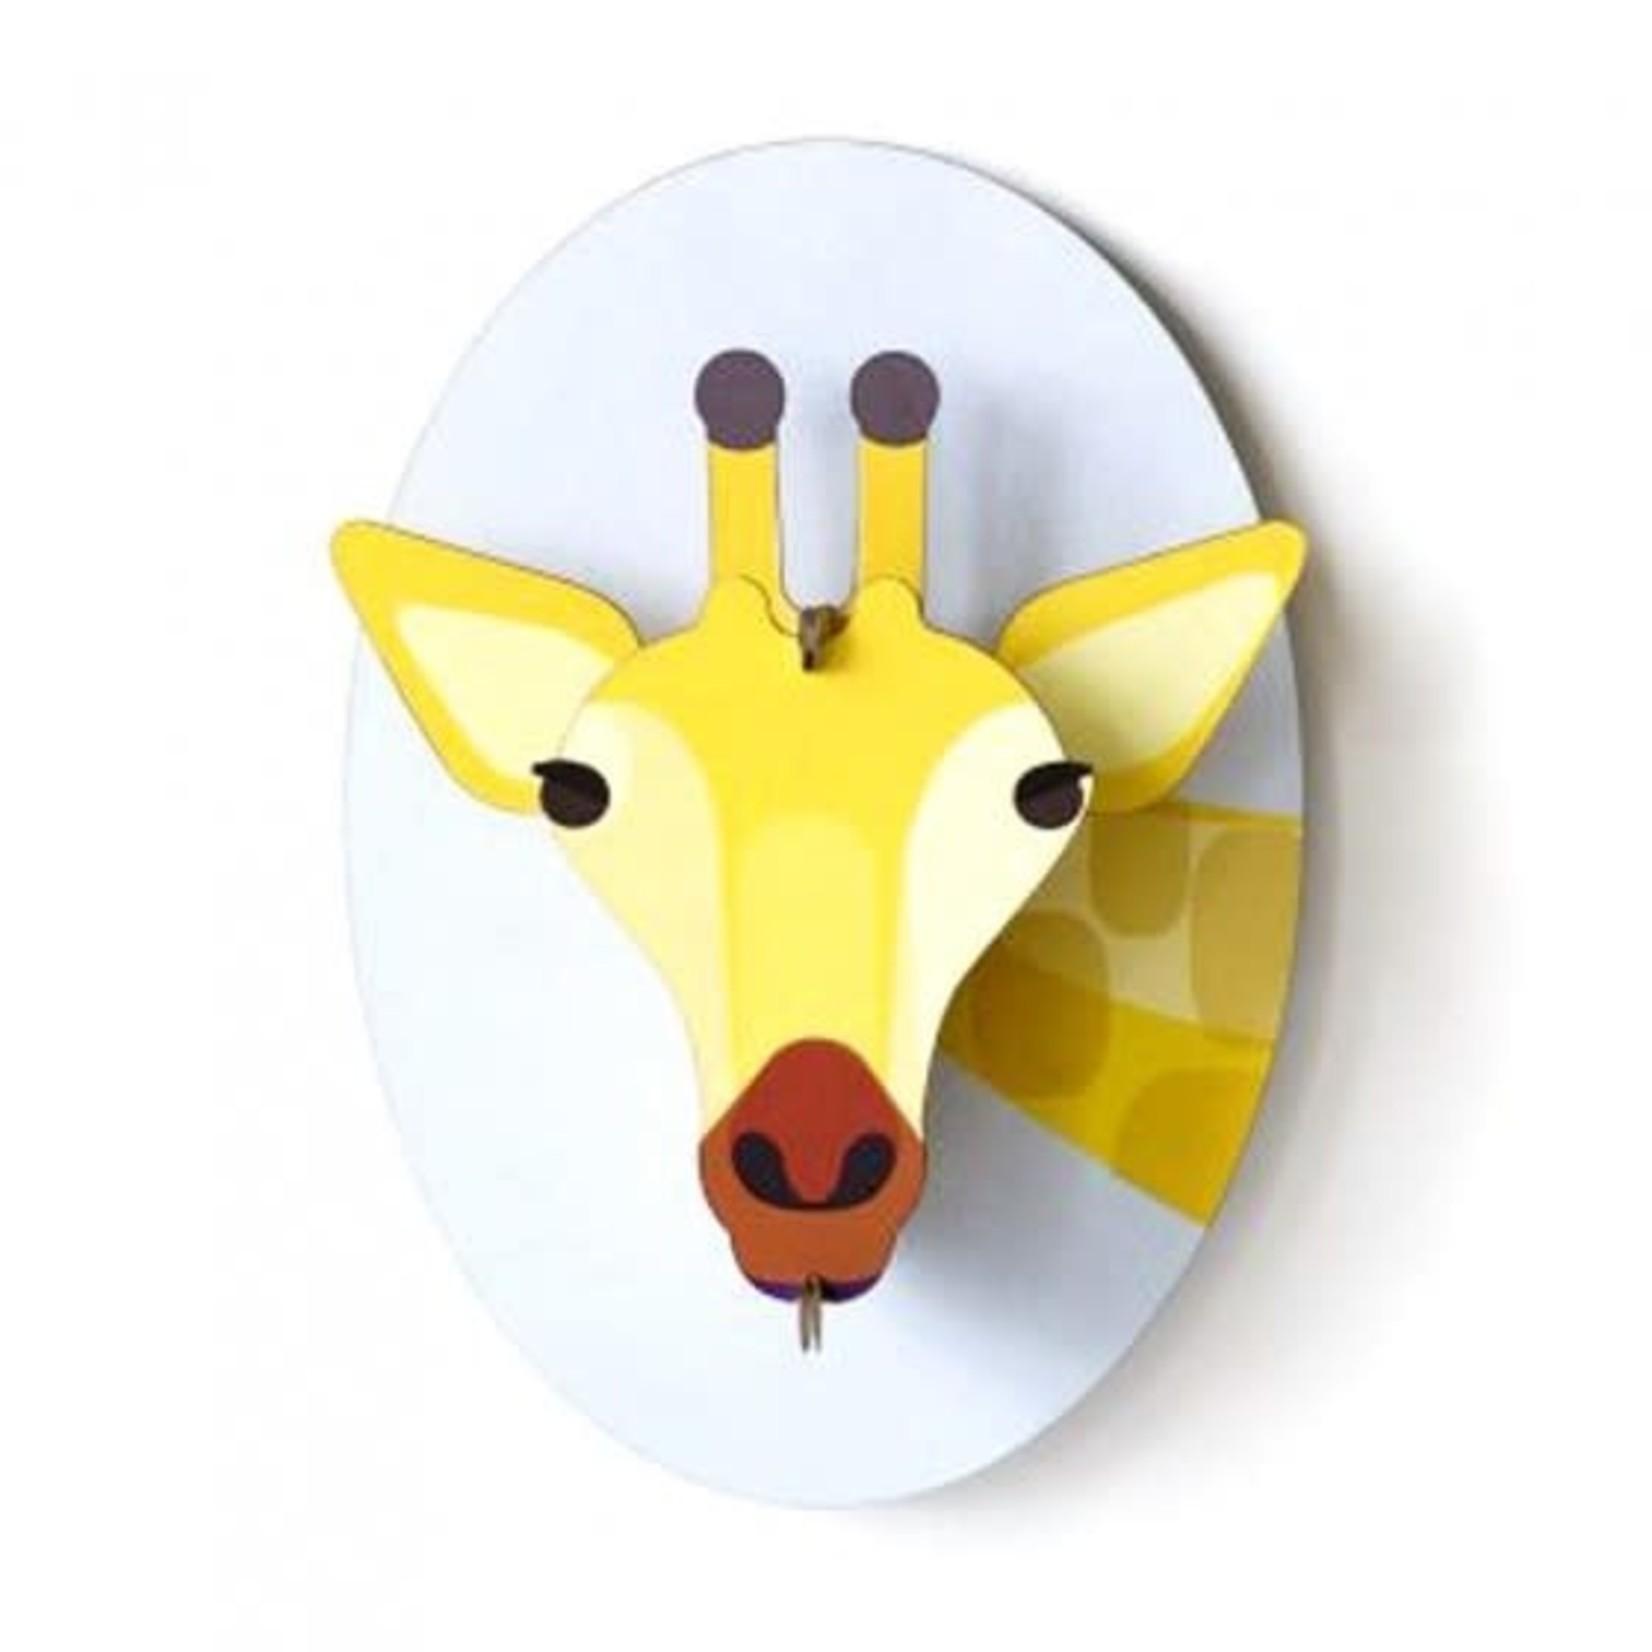 STUDIO ROOF STUDIO ROOF -wall decoration-Little giraf